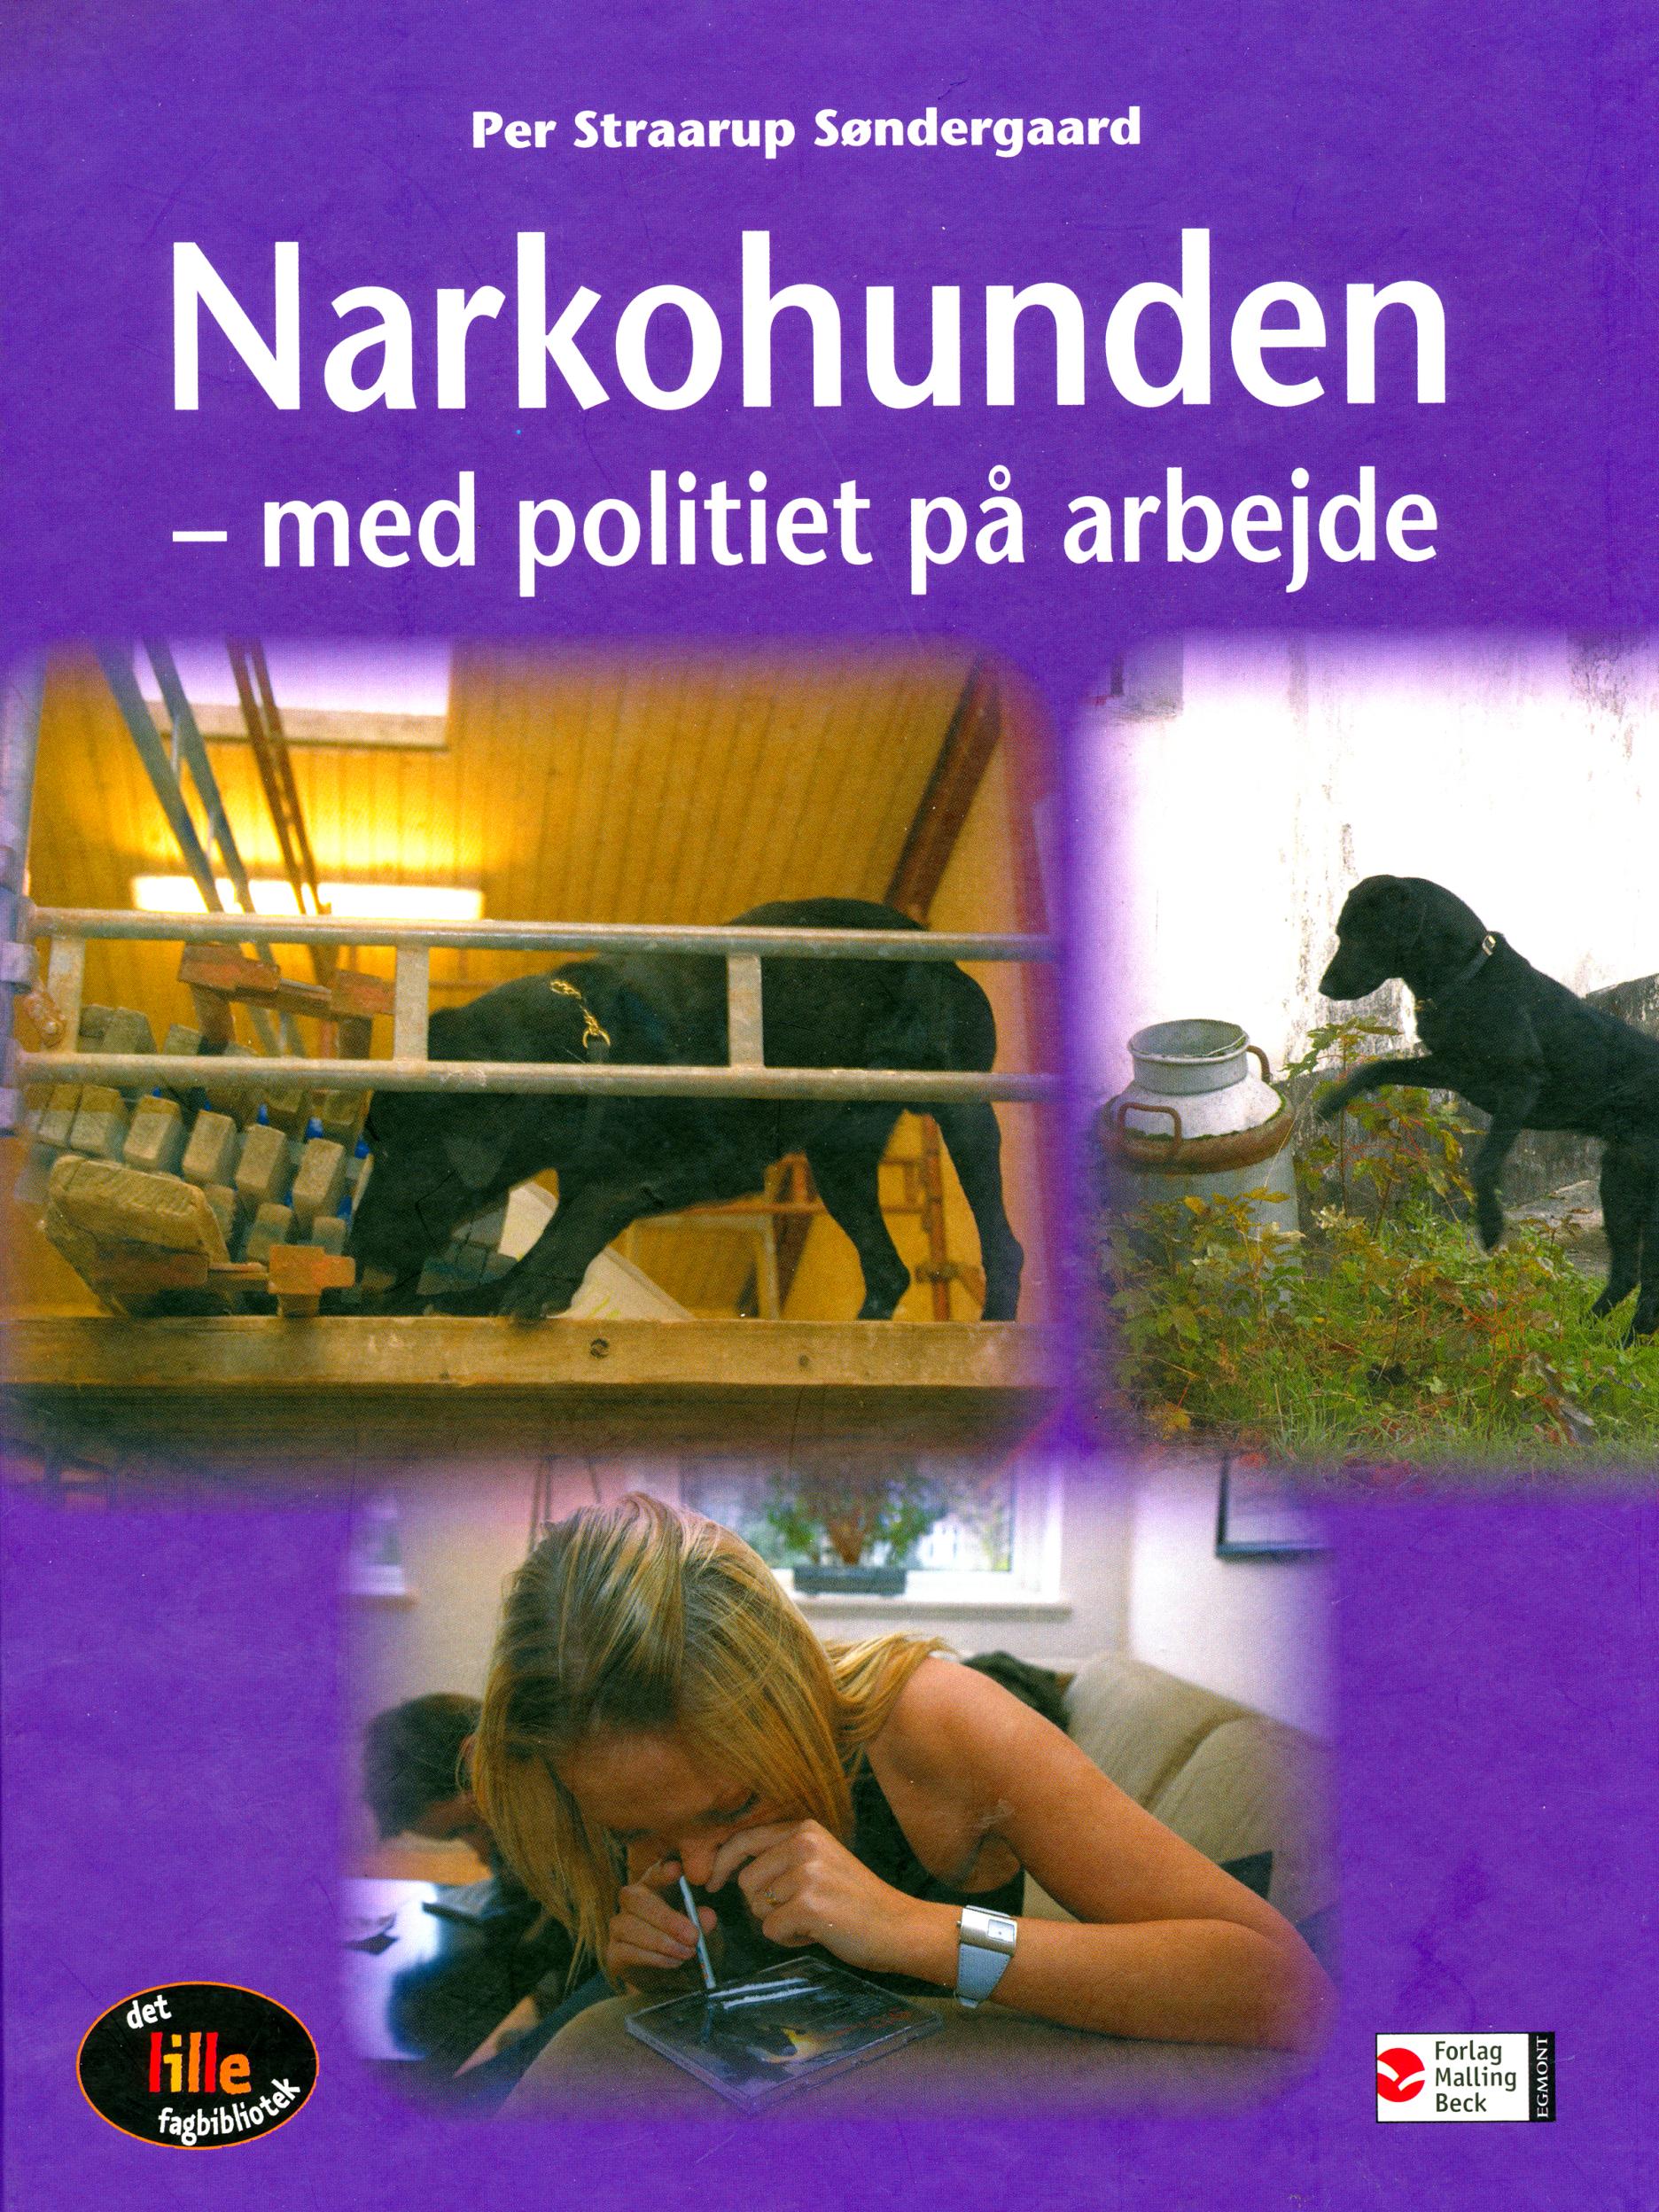 Narkohunden: med politiet på arbejde - Maneno